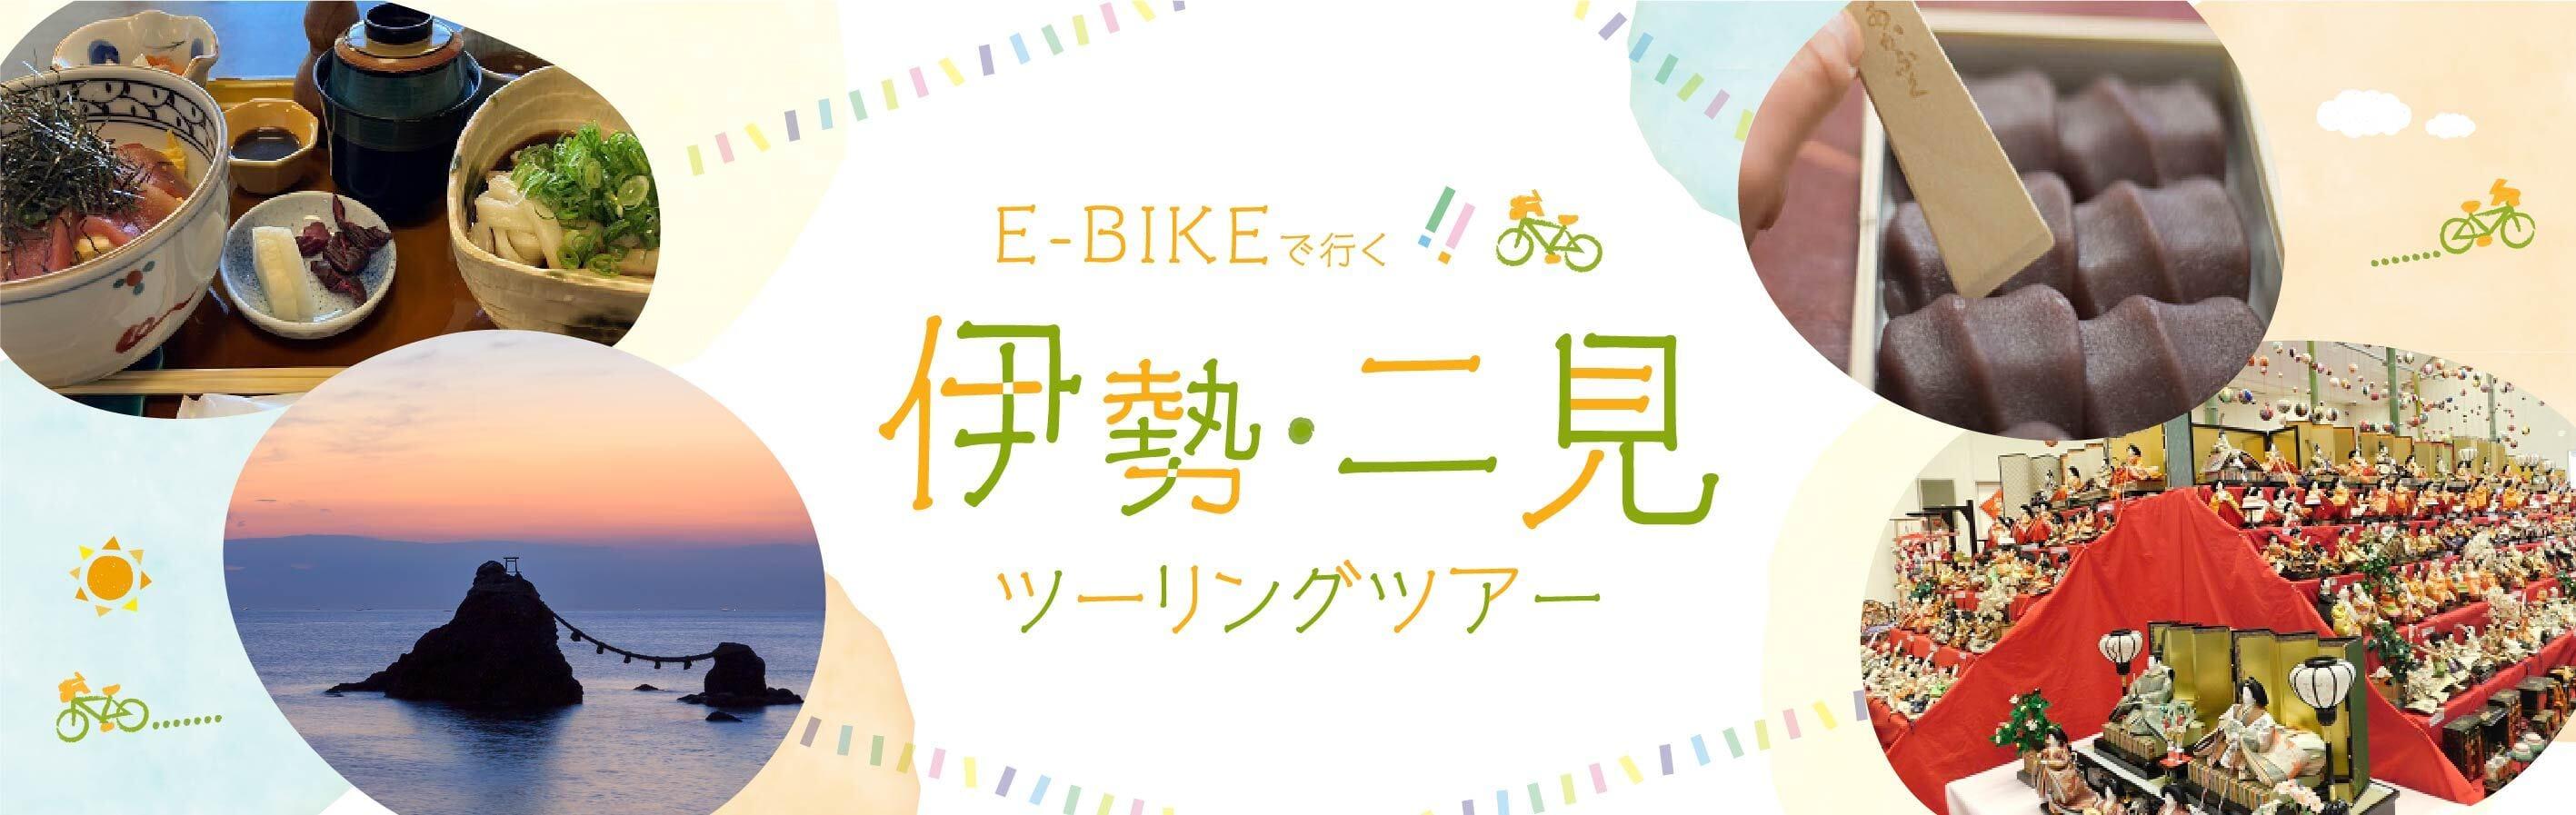 E-BIKEで行く!伊勢・二見ツーリングツアー